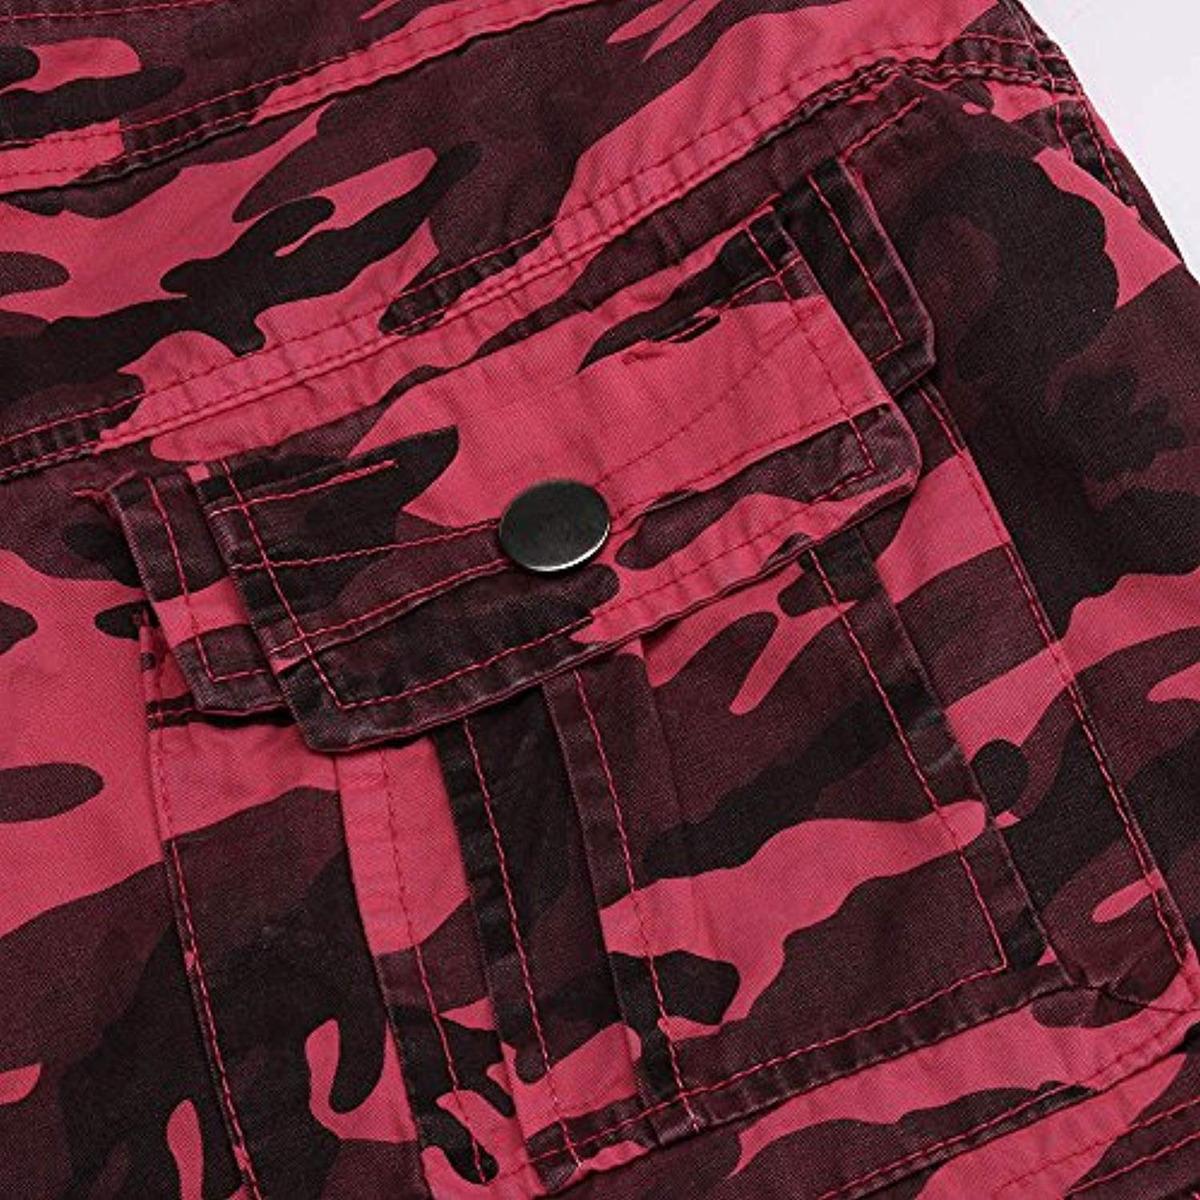 Generic Exercise Bands Sport Kits Adjustable 5PCSet,Black xnsk124